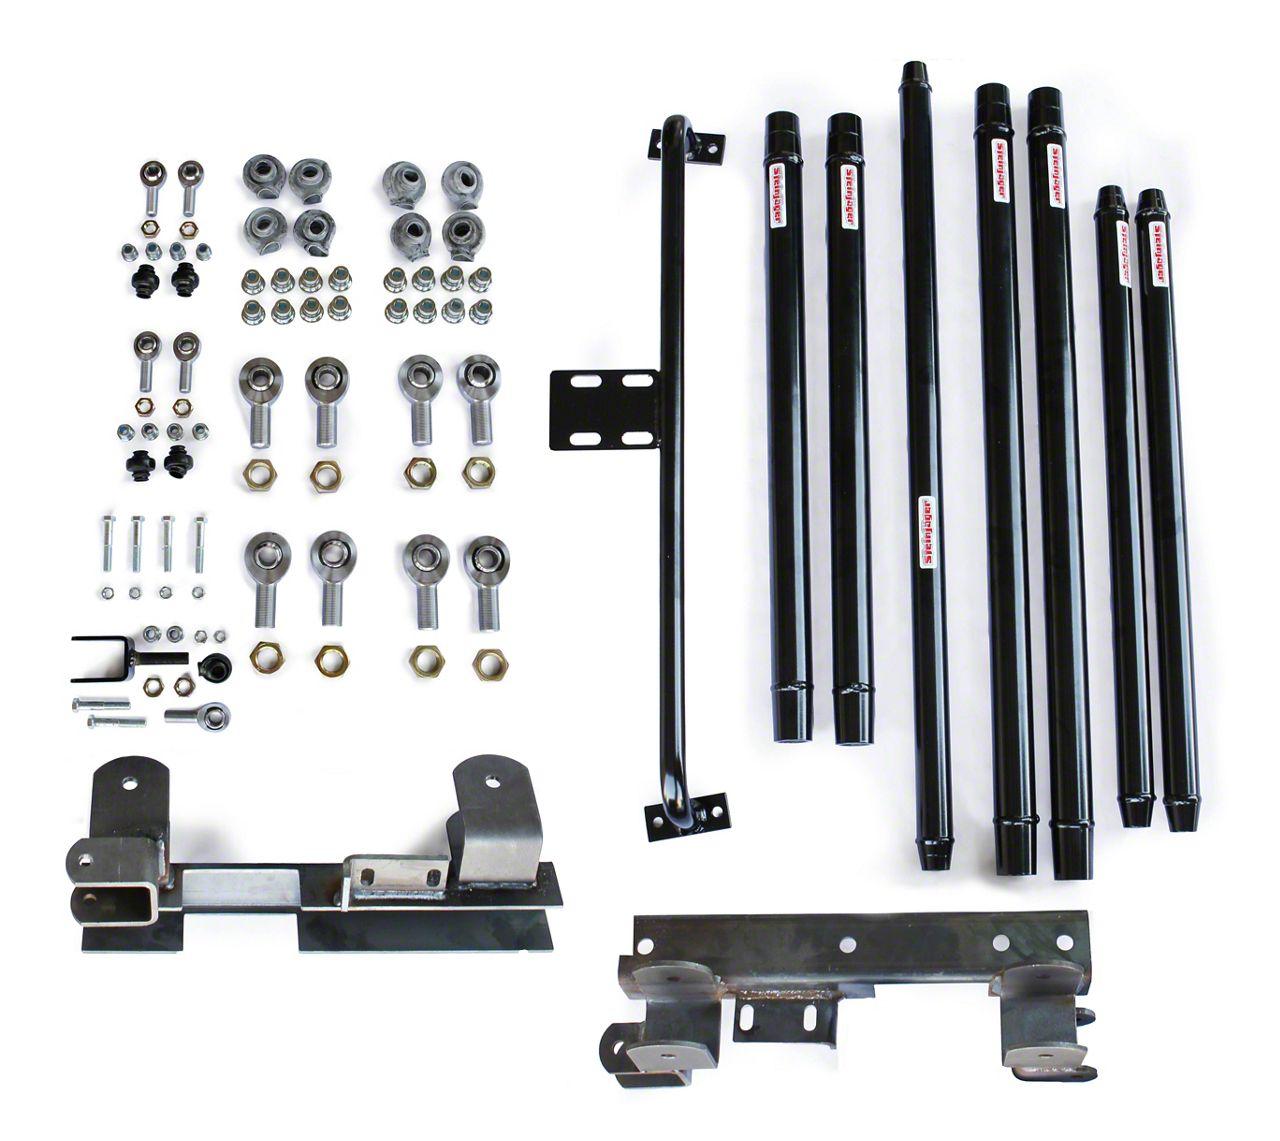 Steinjager Chrome Moly Tube Long Arm Tavel Kit for 2-6 in. Lift - Bare Metal (97-06 Jeep Wrangler TJ)